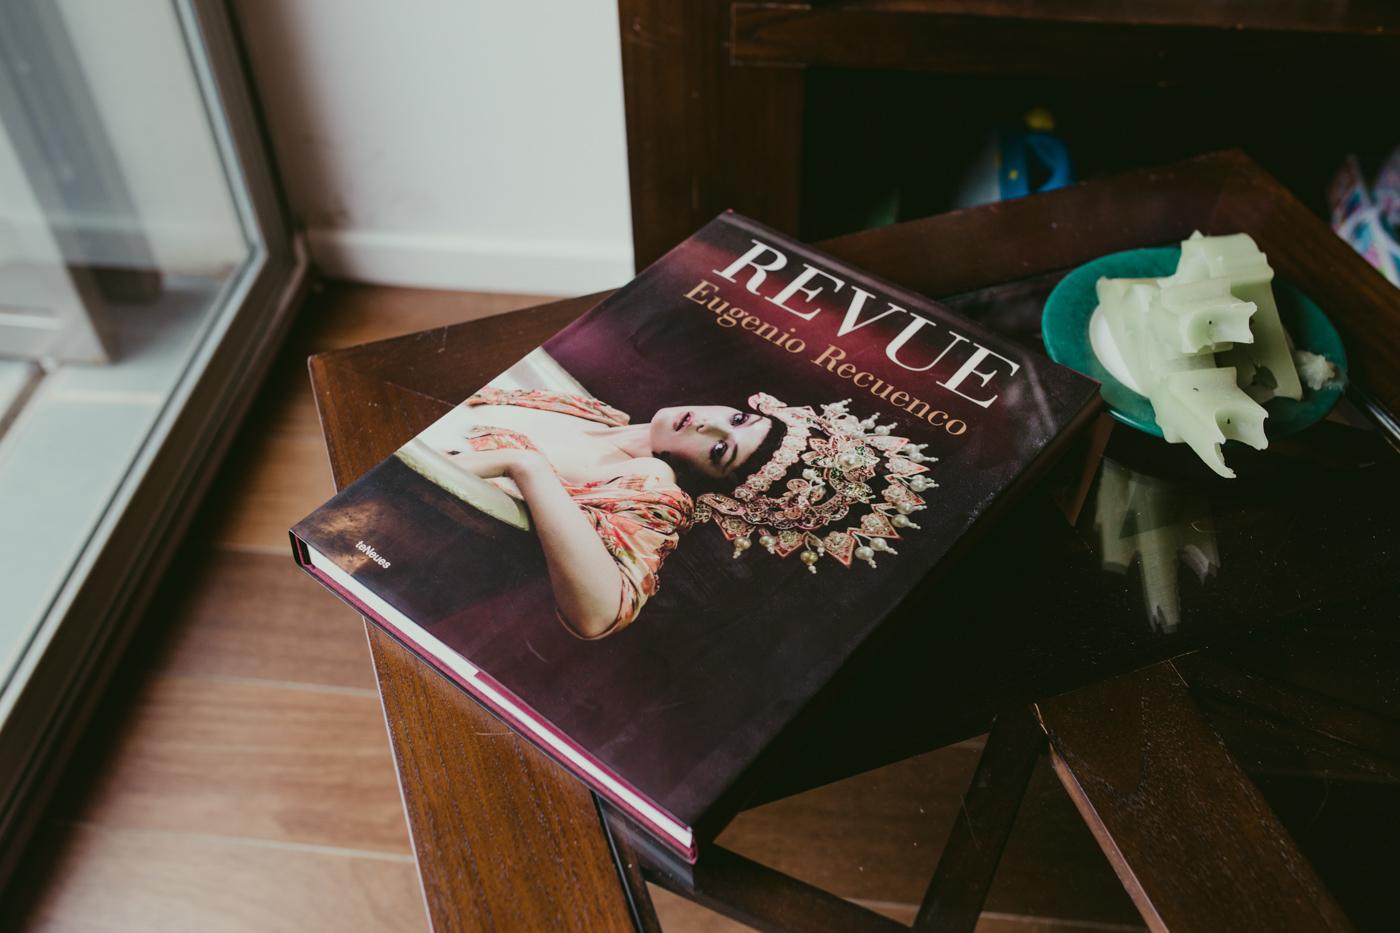 Velvet-Hush-fotografos-sesion-familia-011